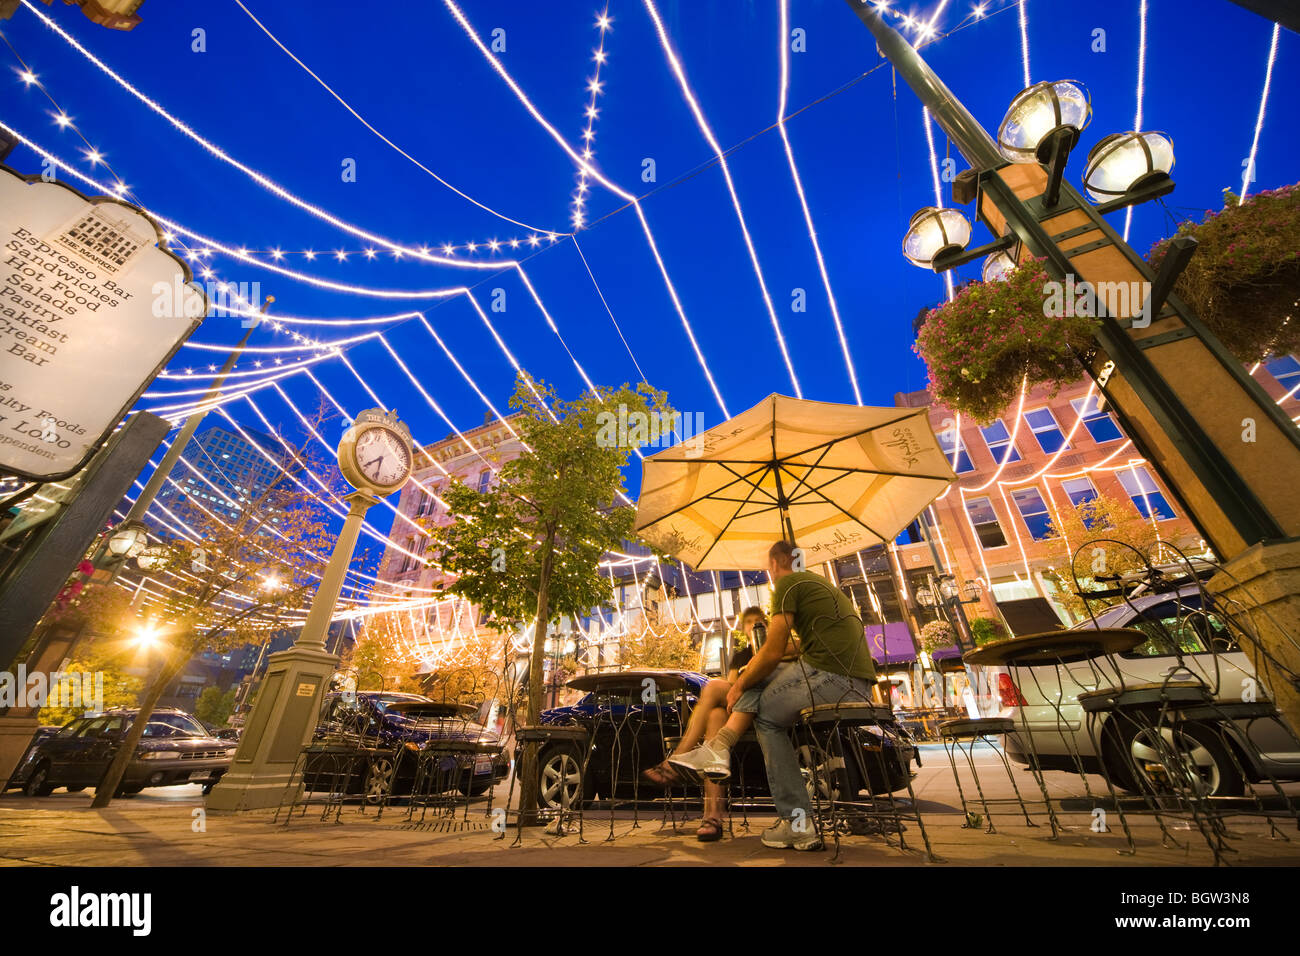 LoDo Denver Deli Restaurant Cafe der Lebensmittelmarkt am Larimer Square, Street in der Abenddämmerung. Stockbild